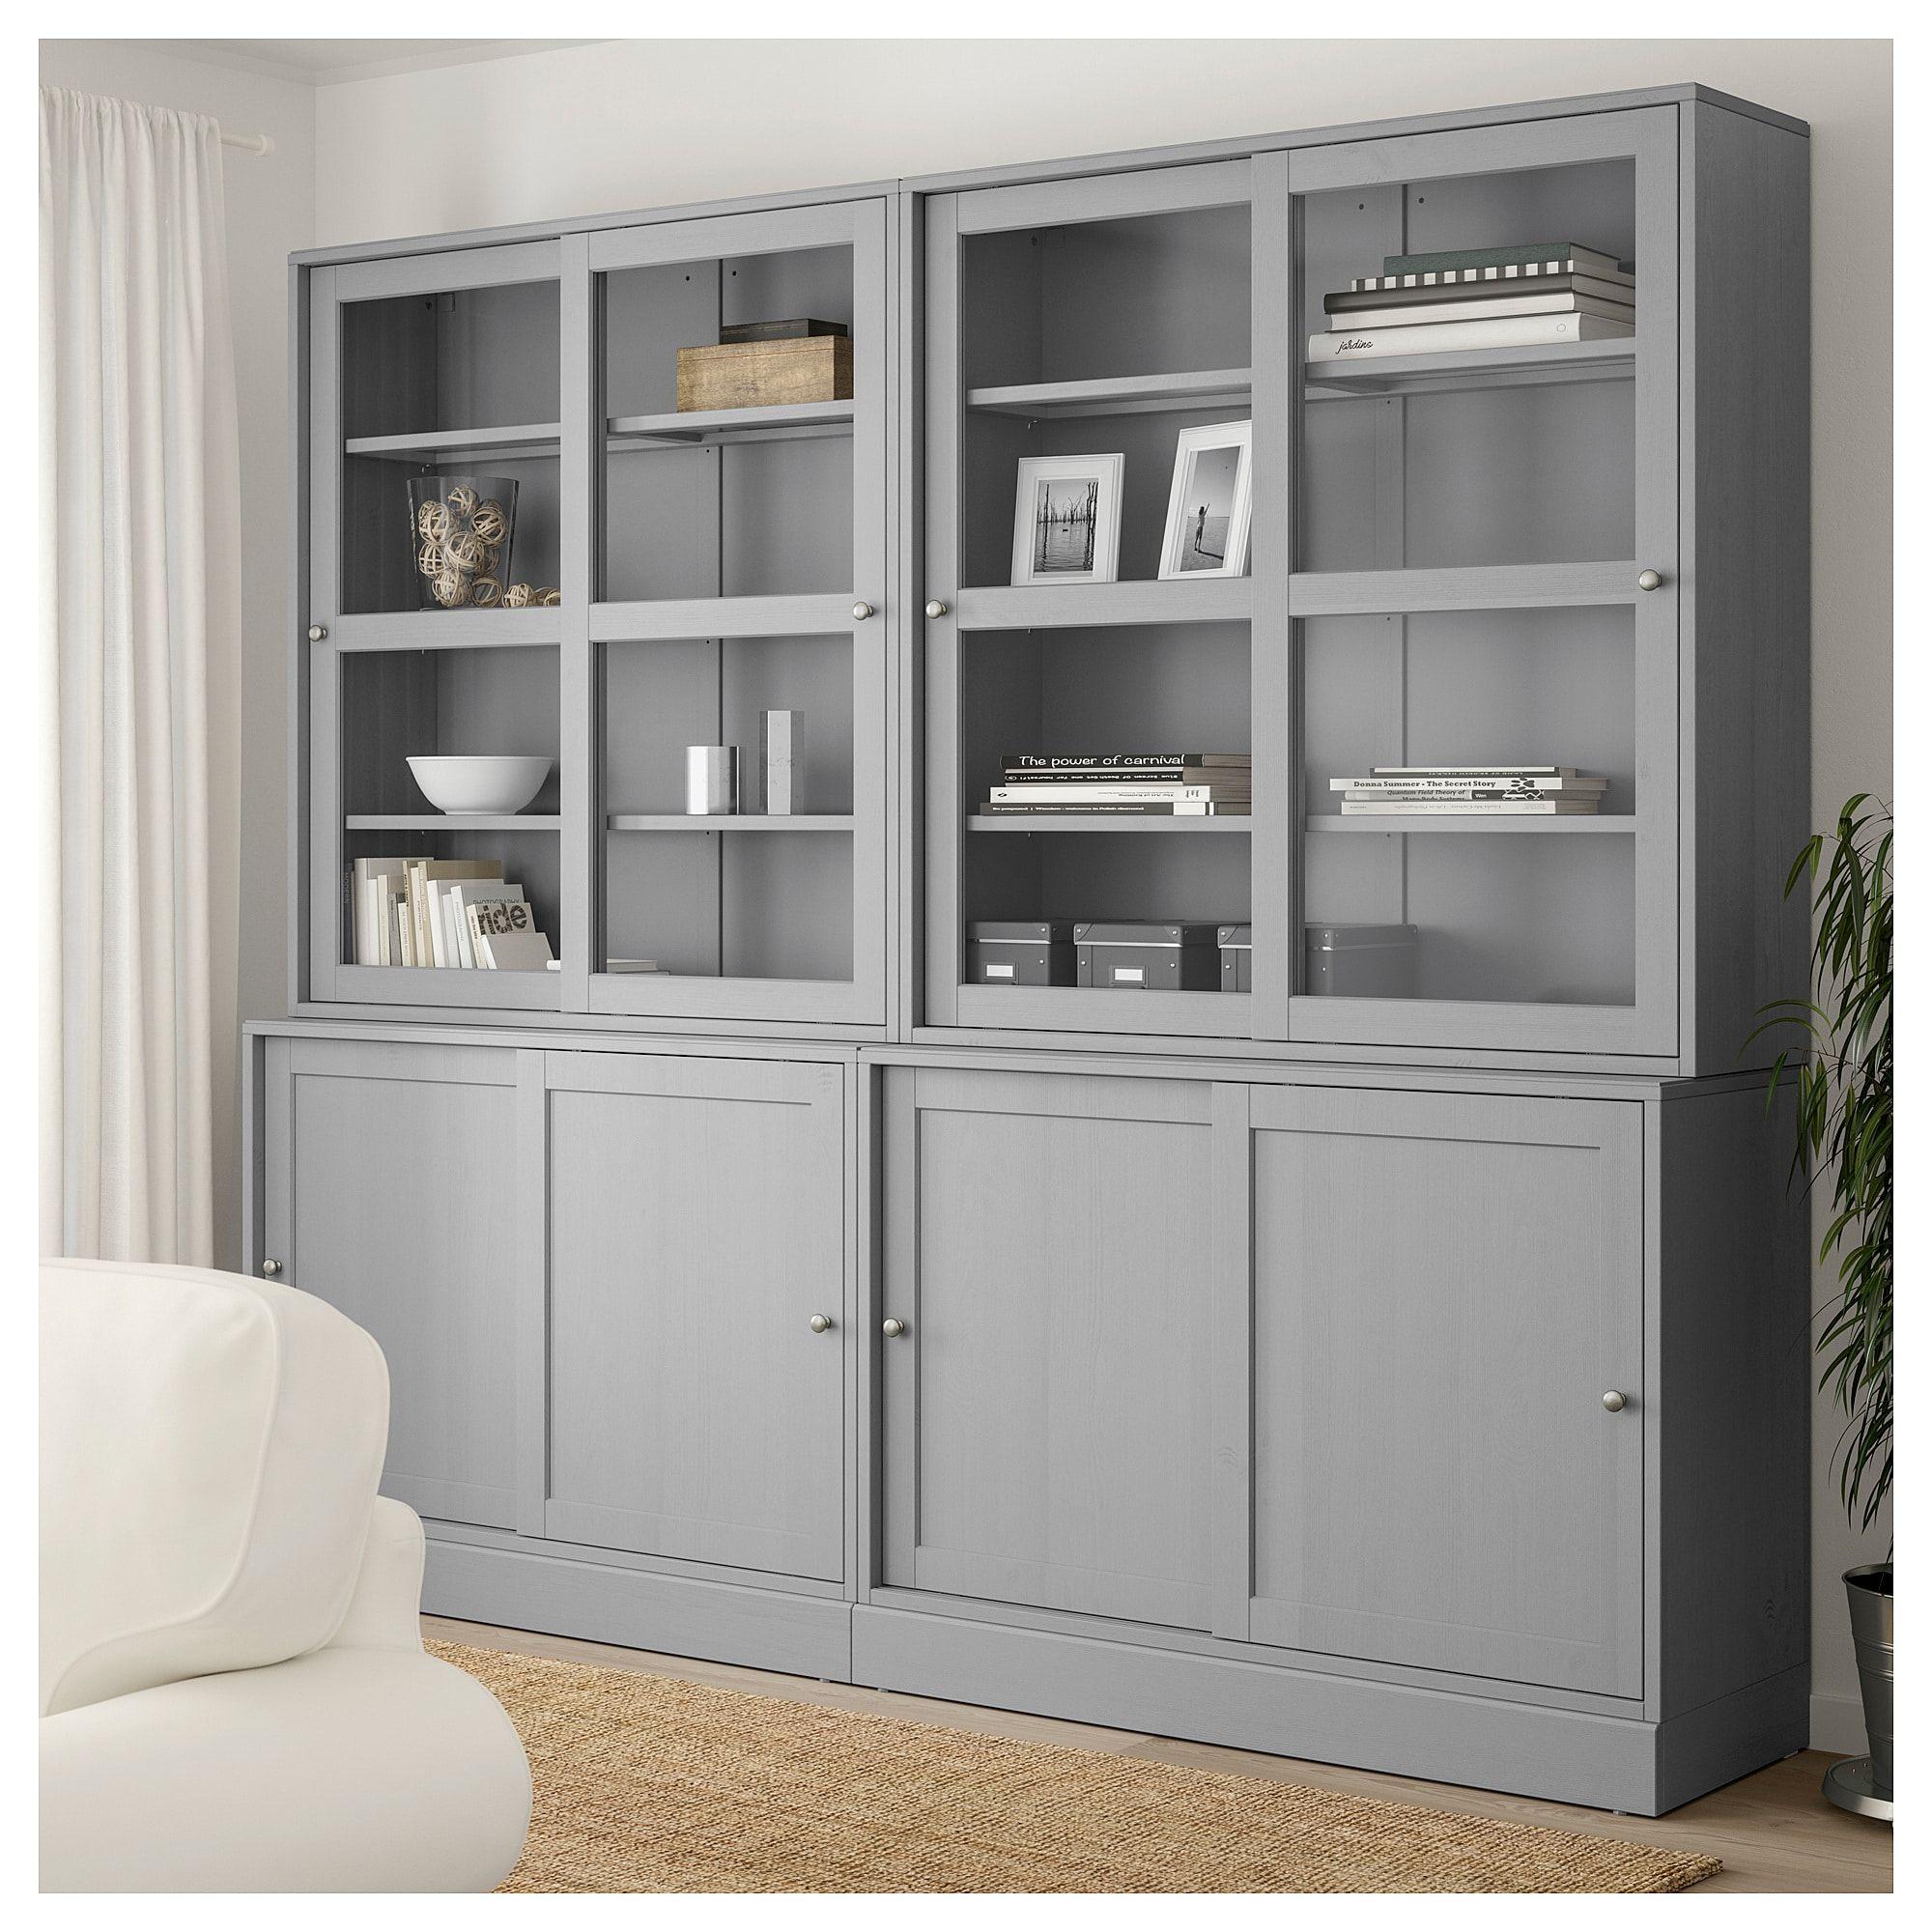 Ikea havsta storage with sliding glass doors gray